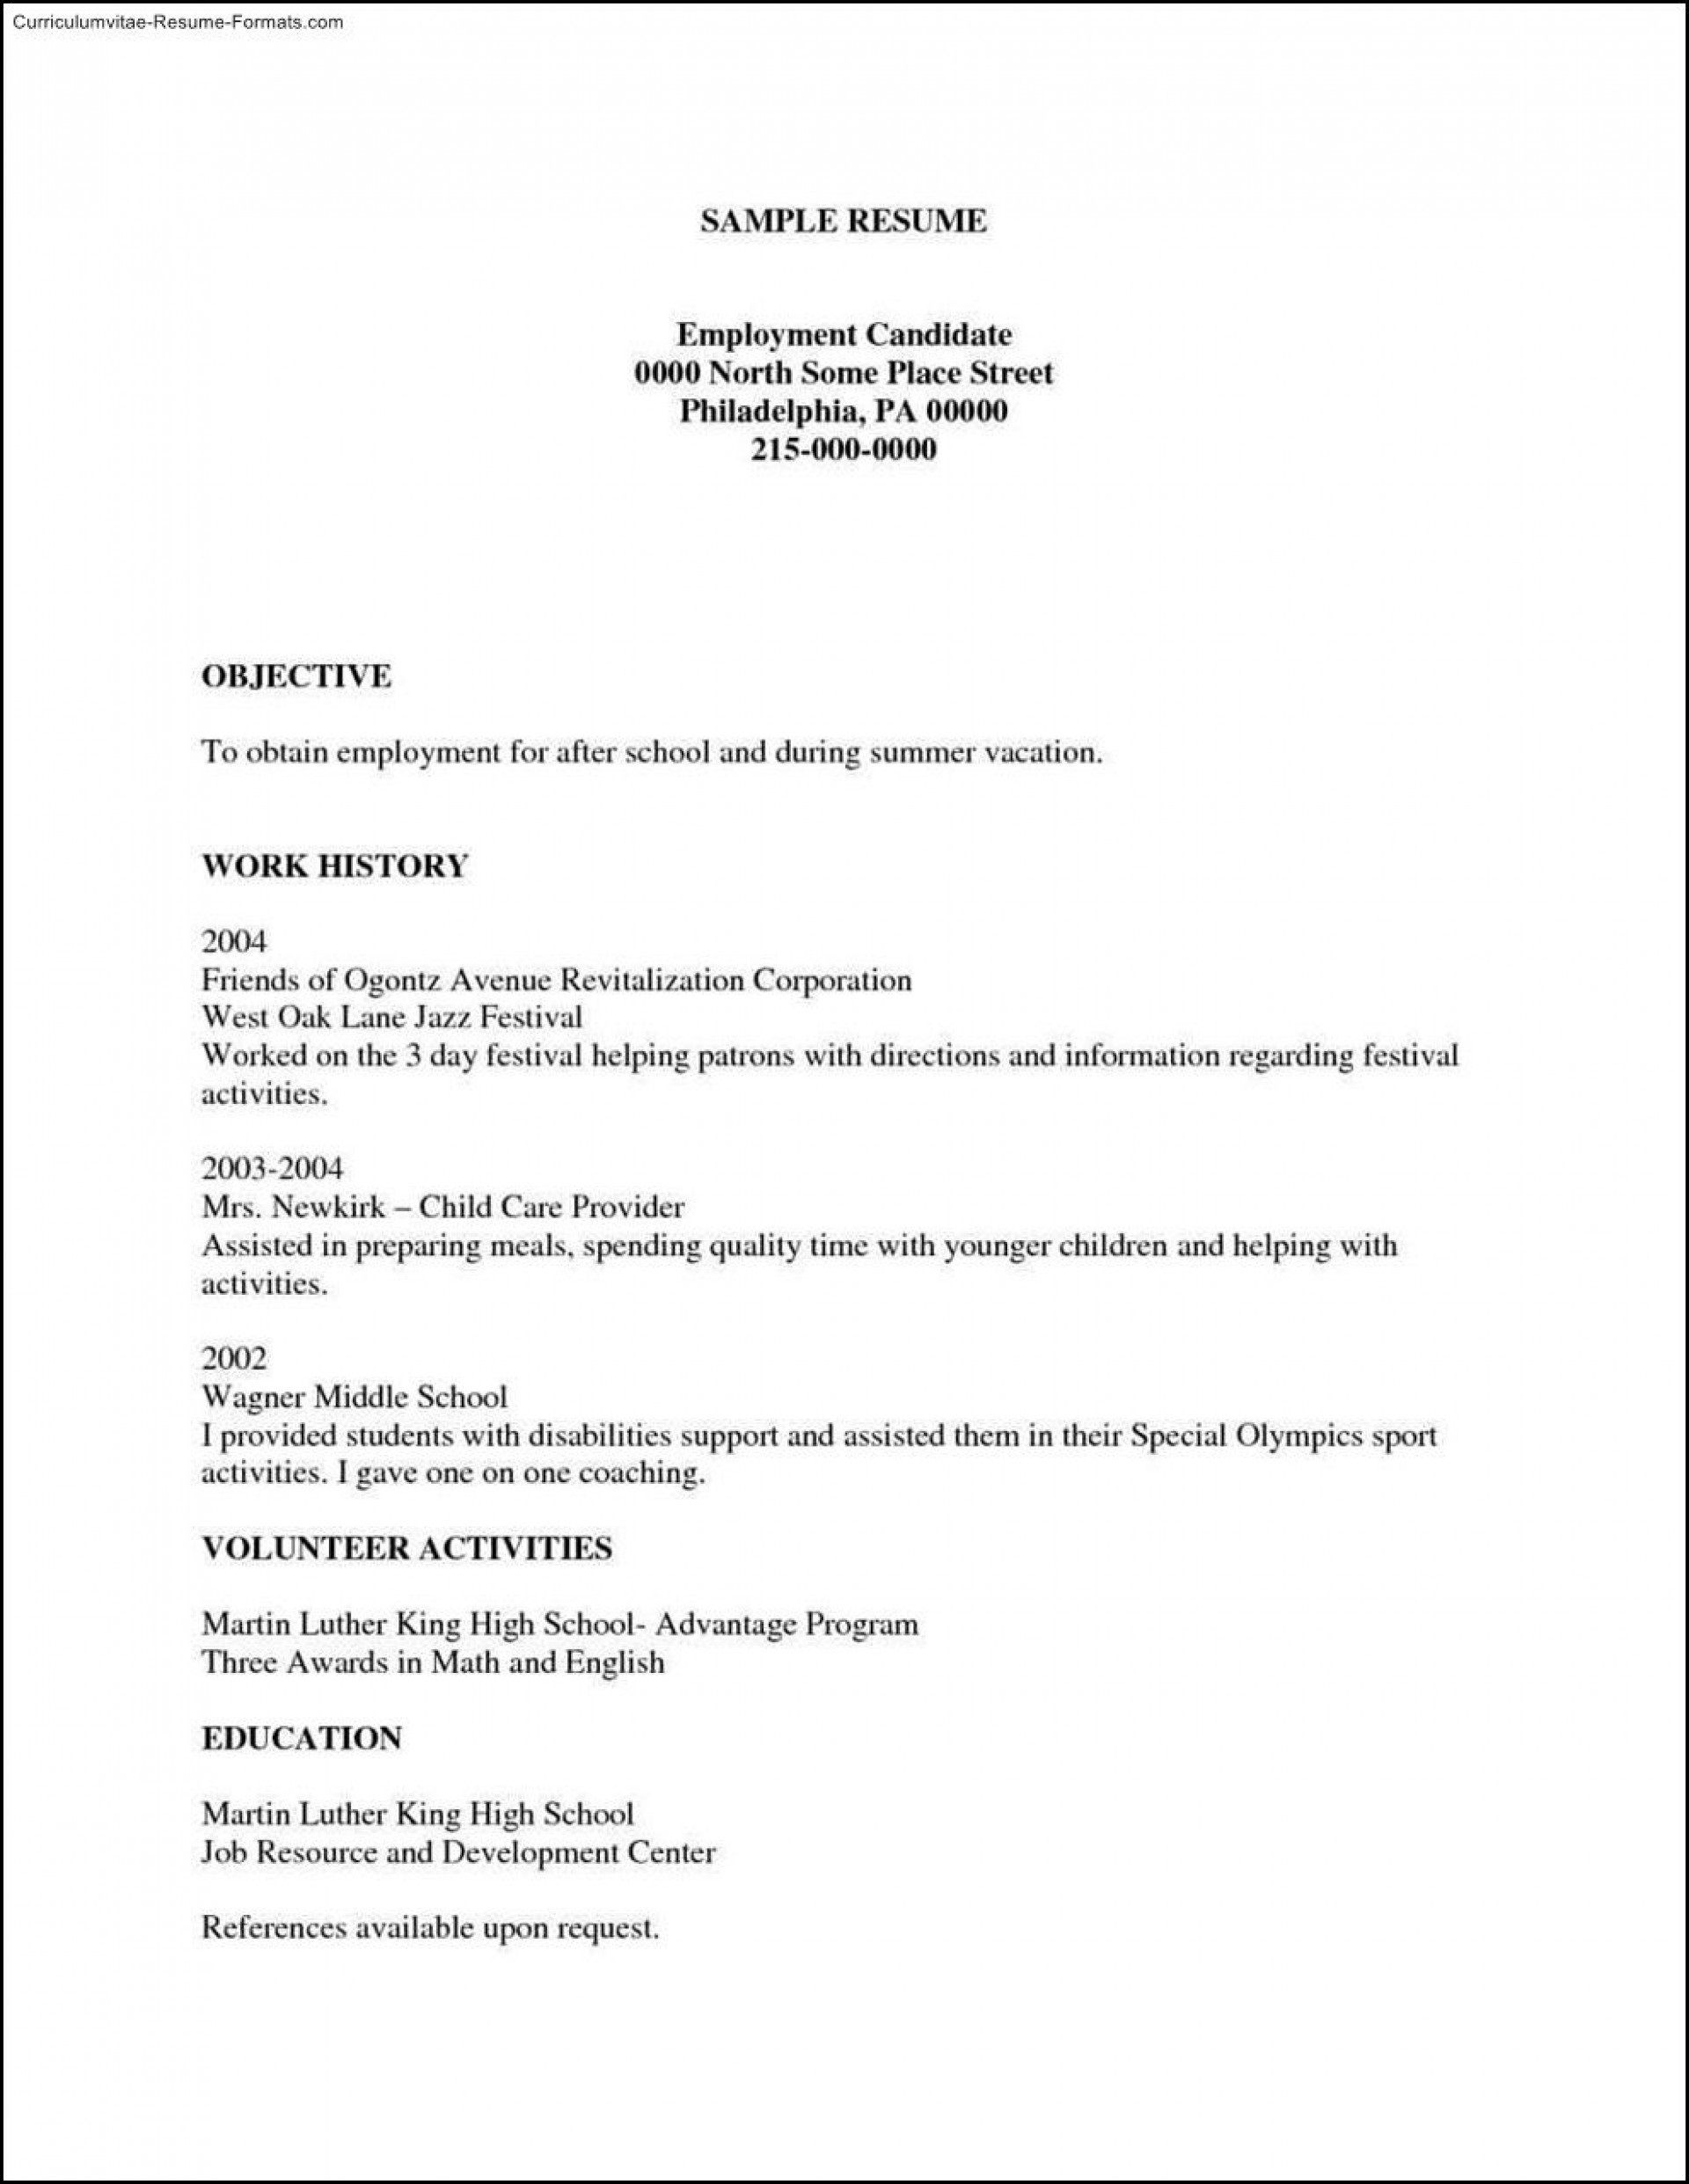 005 Simple Free Basic Blank Resume Template Image  Templates Word Printable To PrintFull